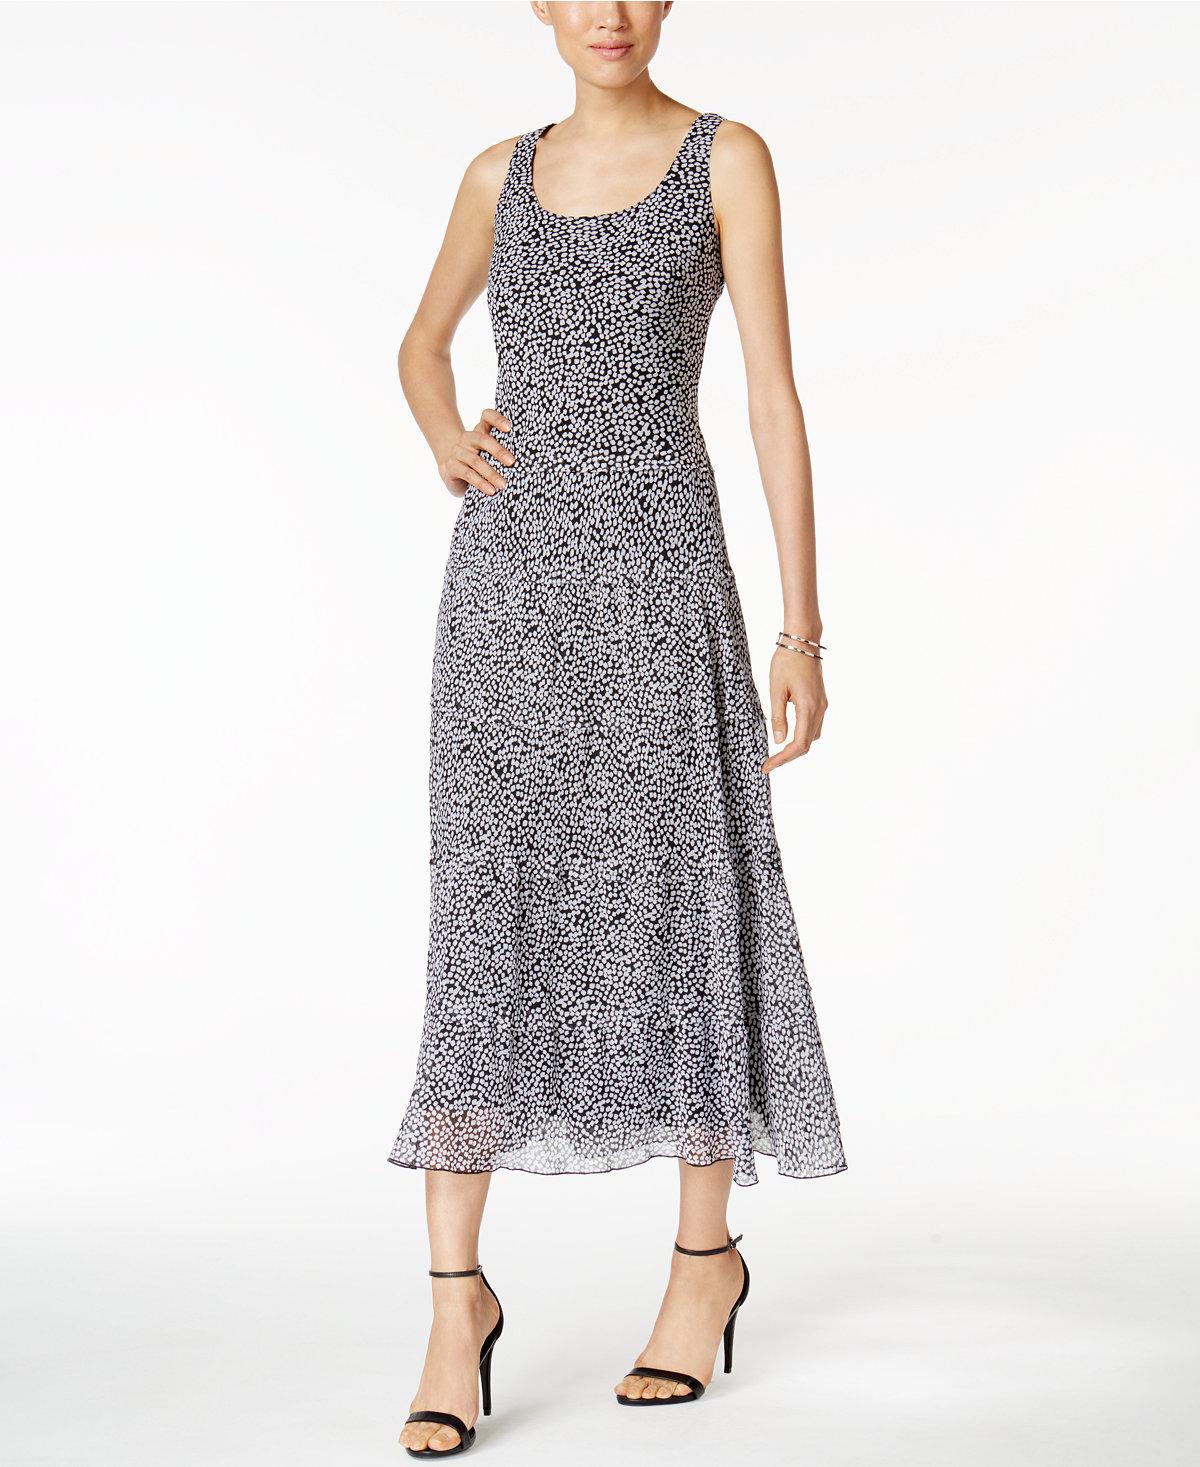 Macys deals on Nine West Printed Tiered Maxi Dress